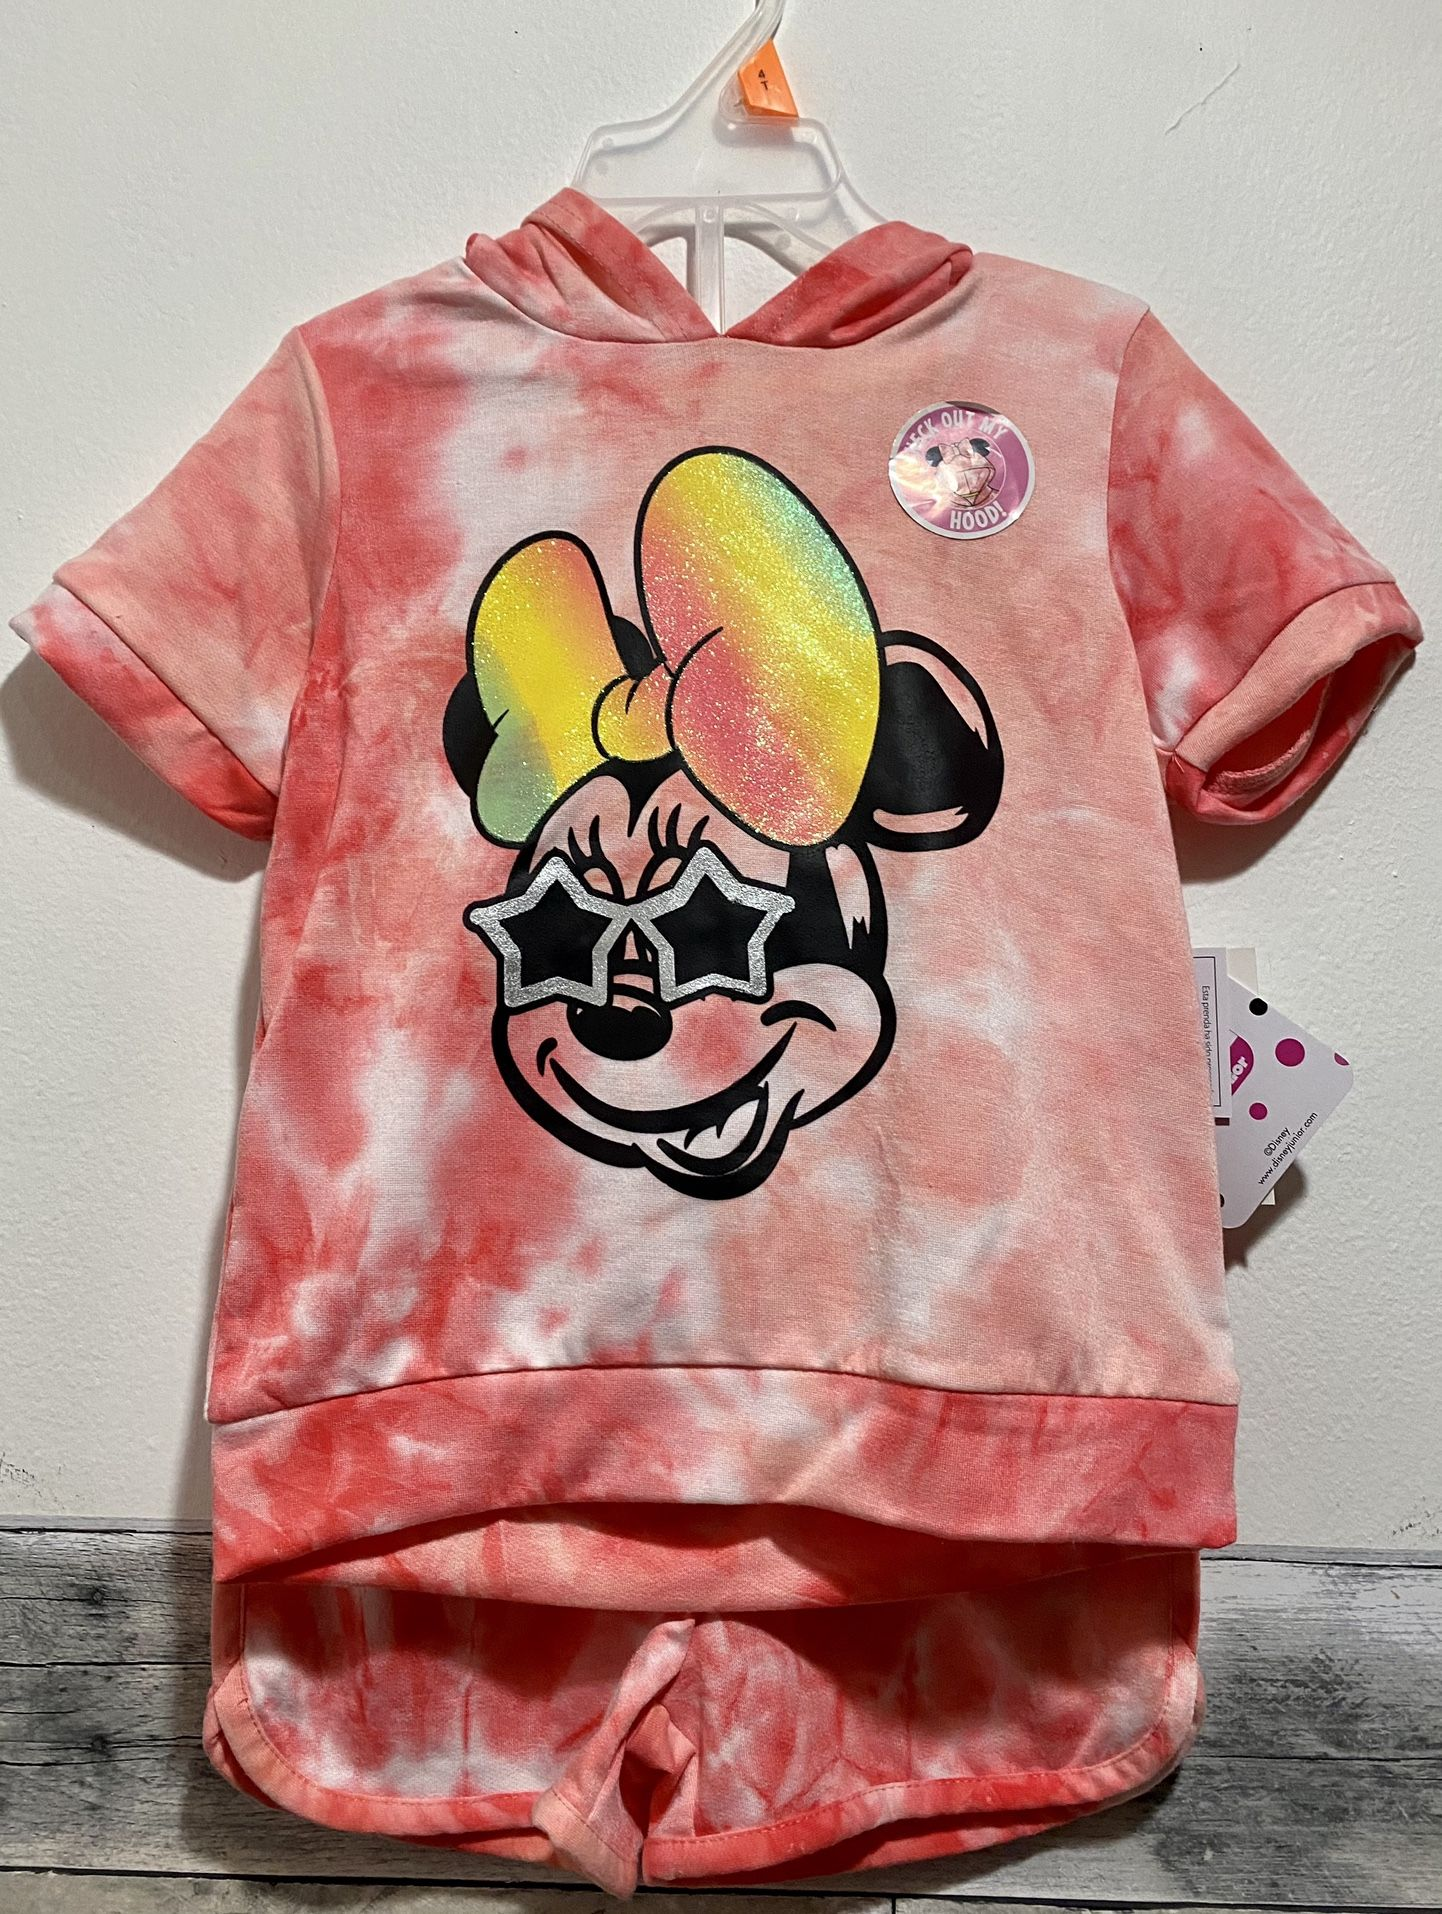 Disney Junior Minnie Mouse Ears Hoodie Set. Color pink size 2T/3T/4T